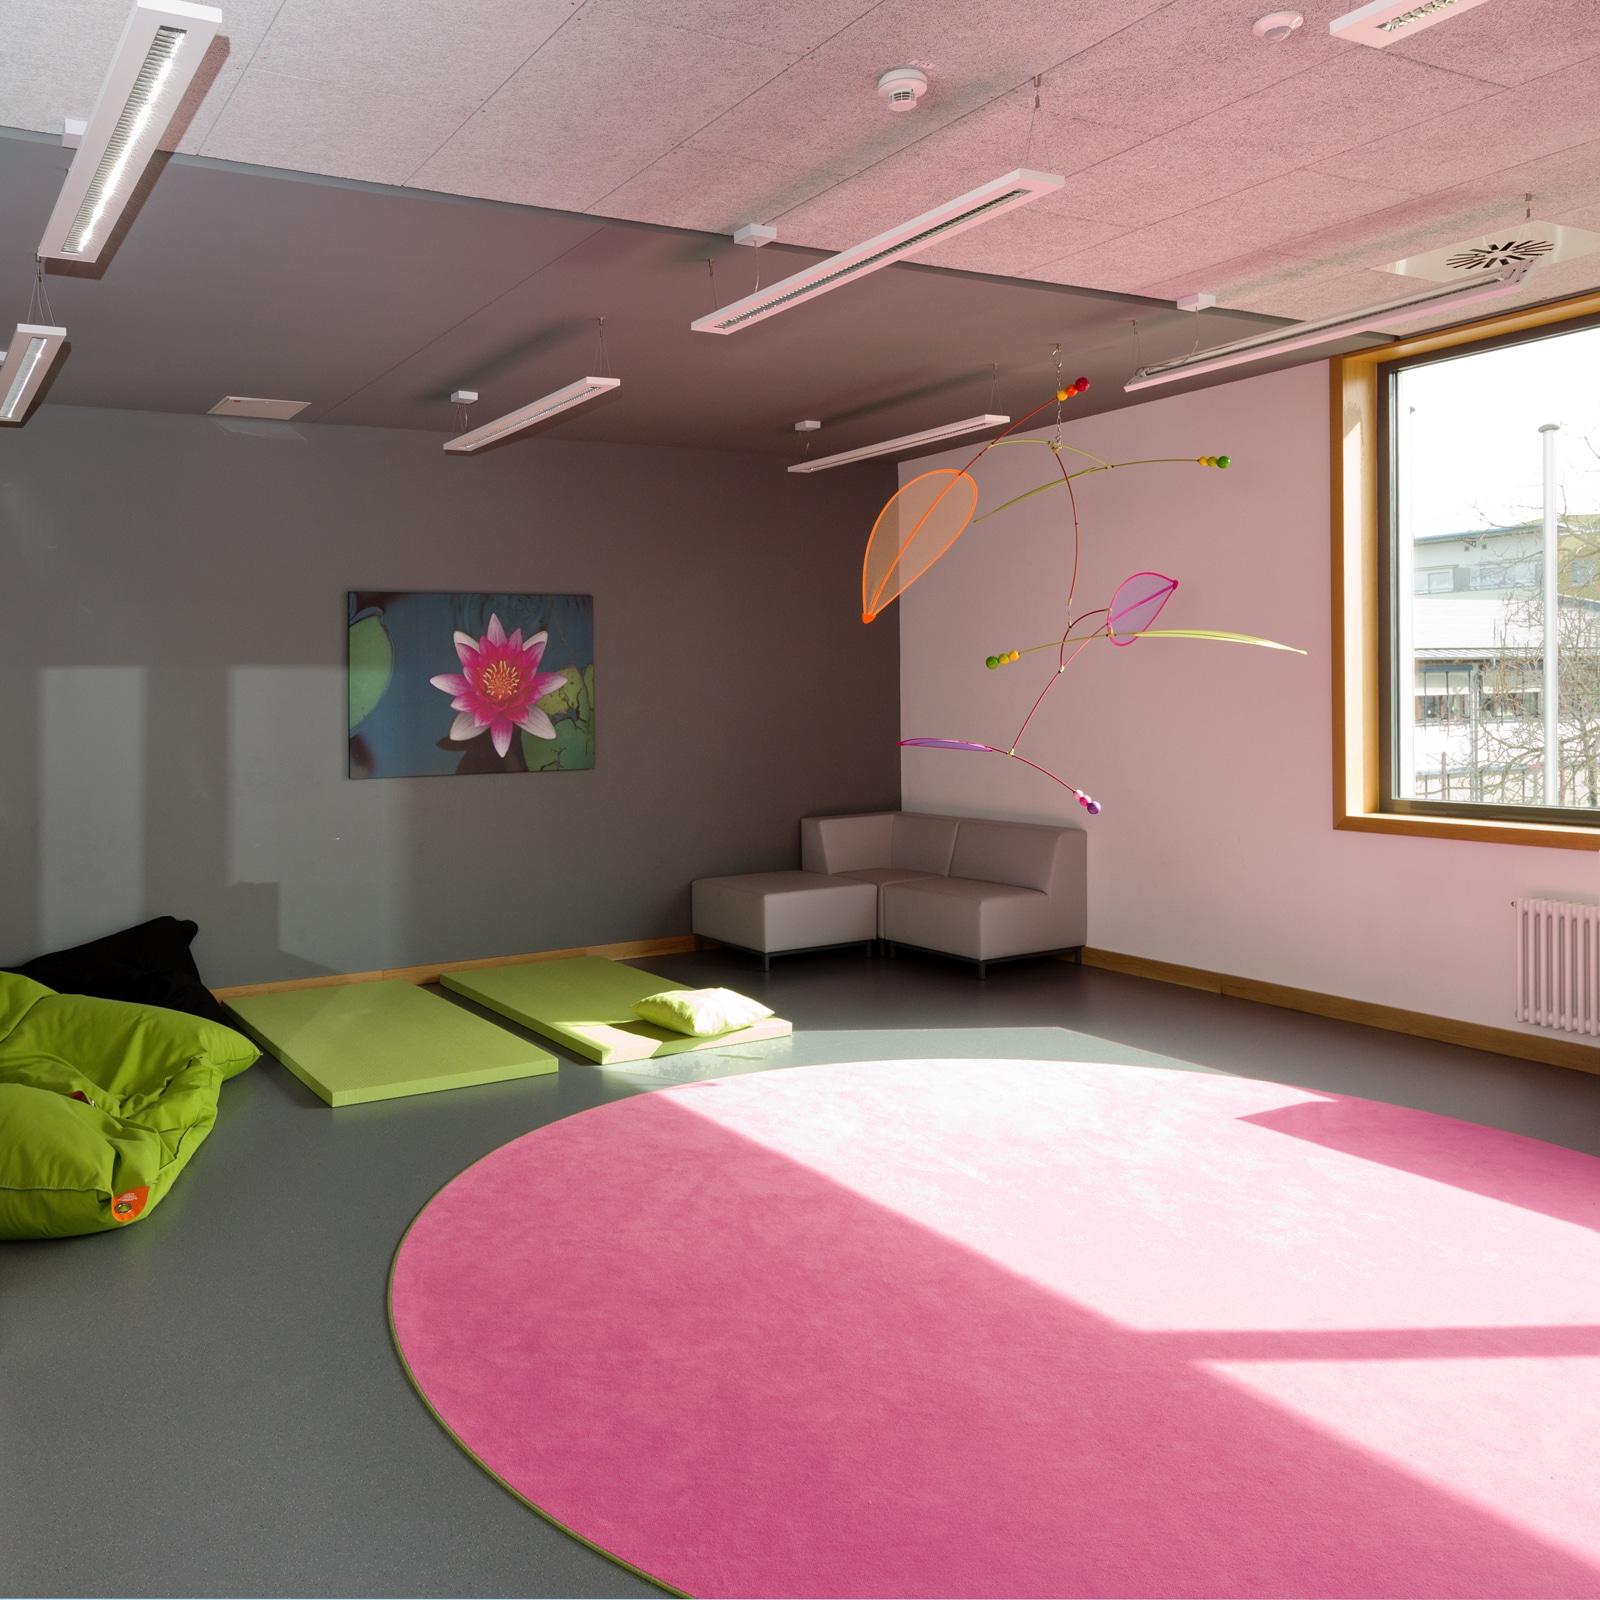 Berta-Hirsch-Schule Innenansicht